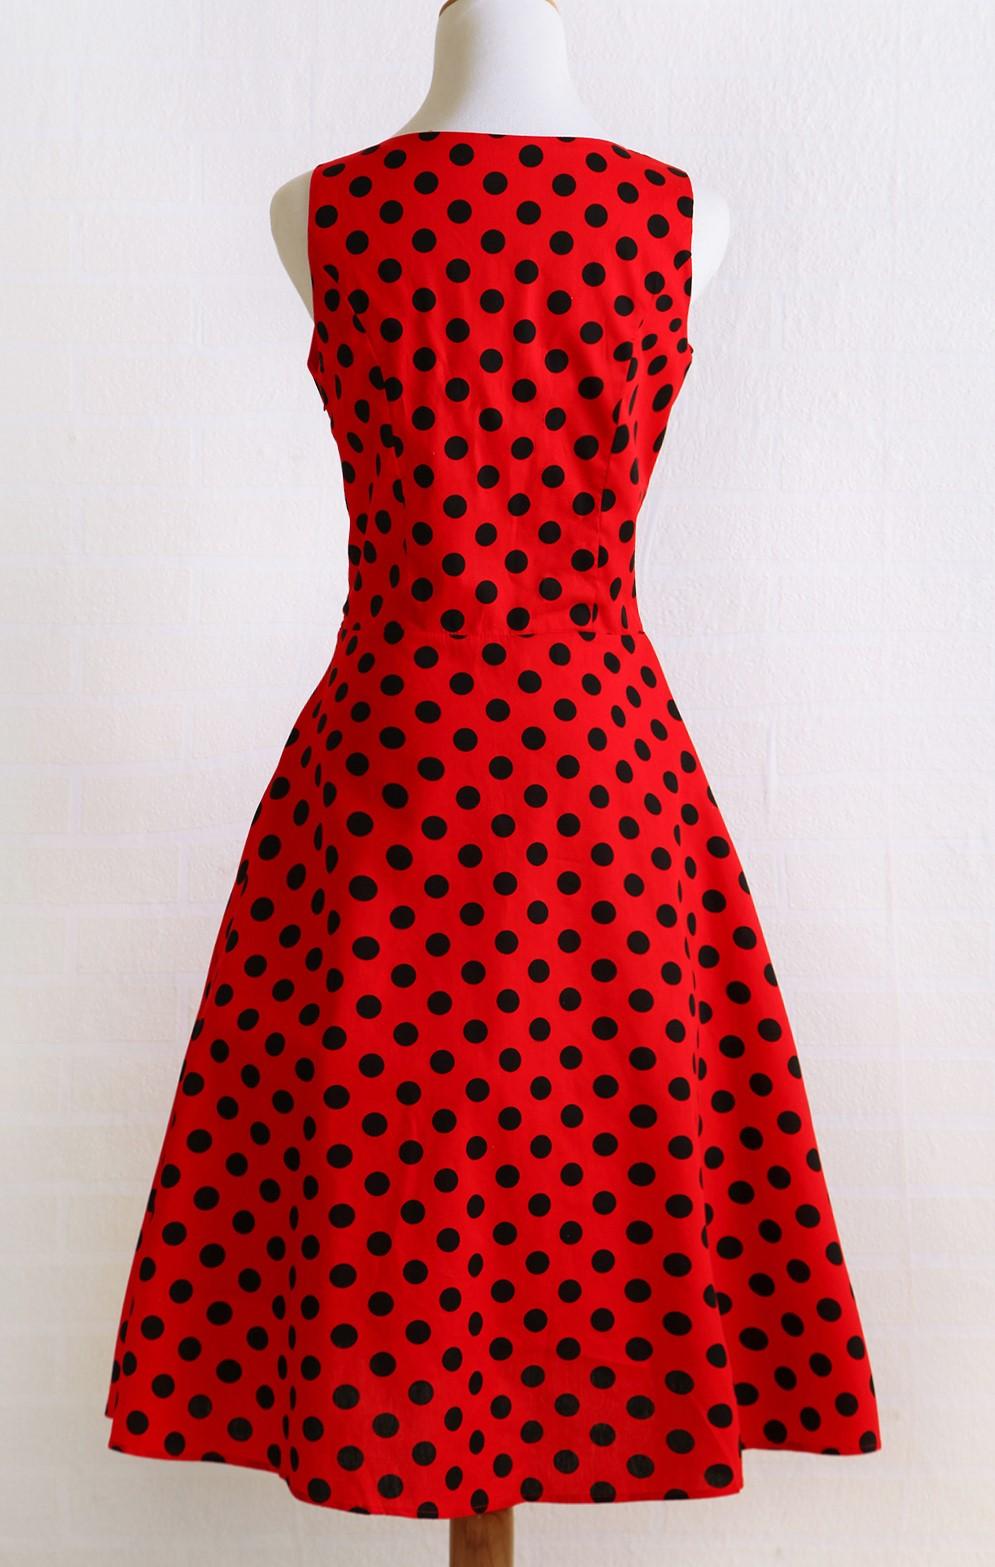 f0088ca5441d8 Candow Look Women Audrey Hepburn Summer Plus Size Vintage Rockabilly Red  Black Polka Dot 50s 60s Party Swing Circle Girl Dress